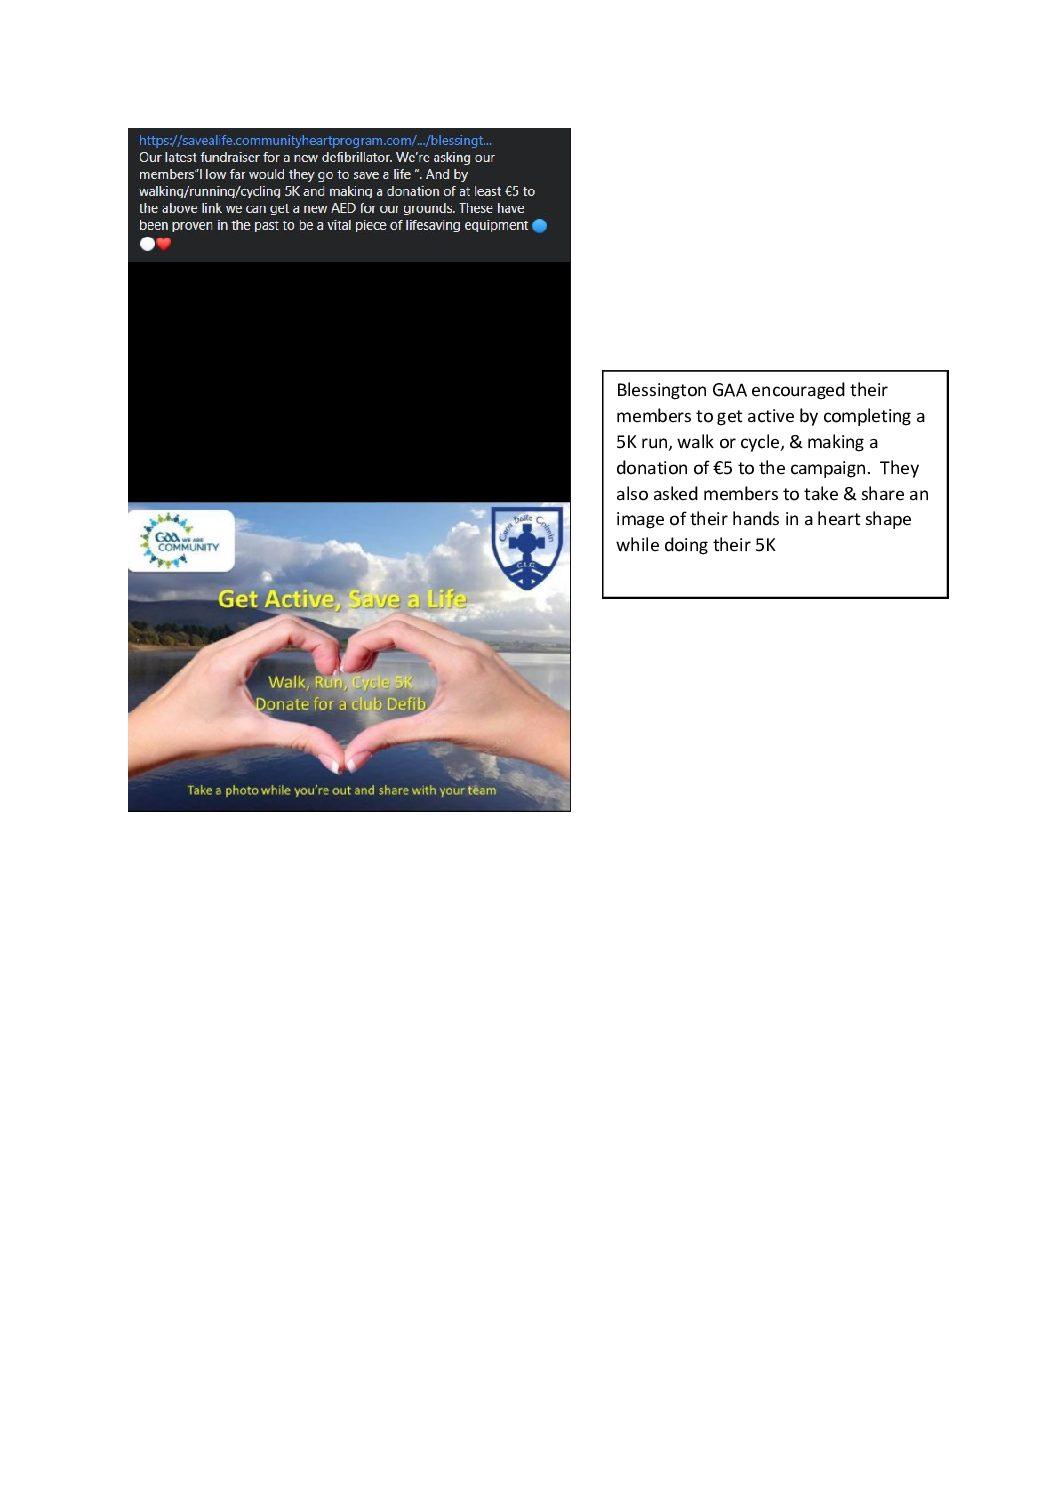 Community Heart Programme